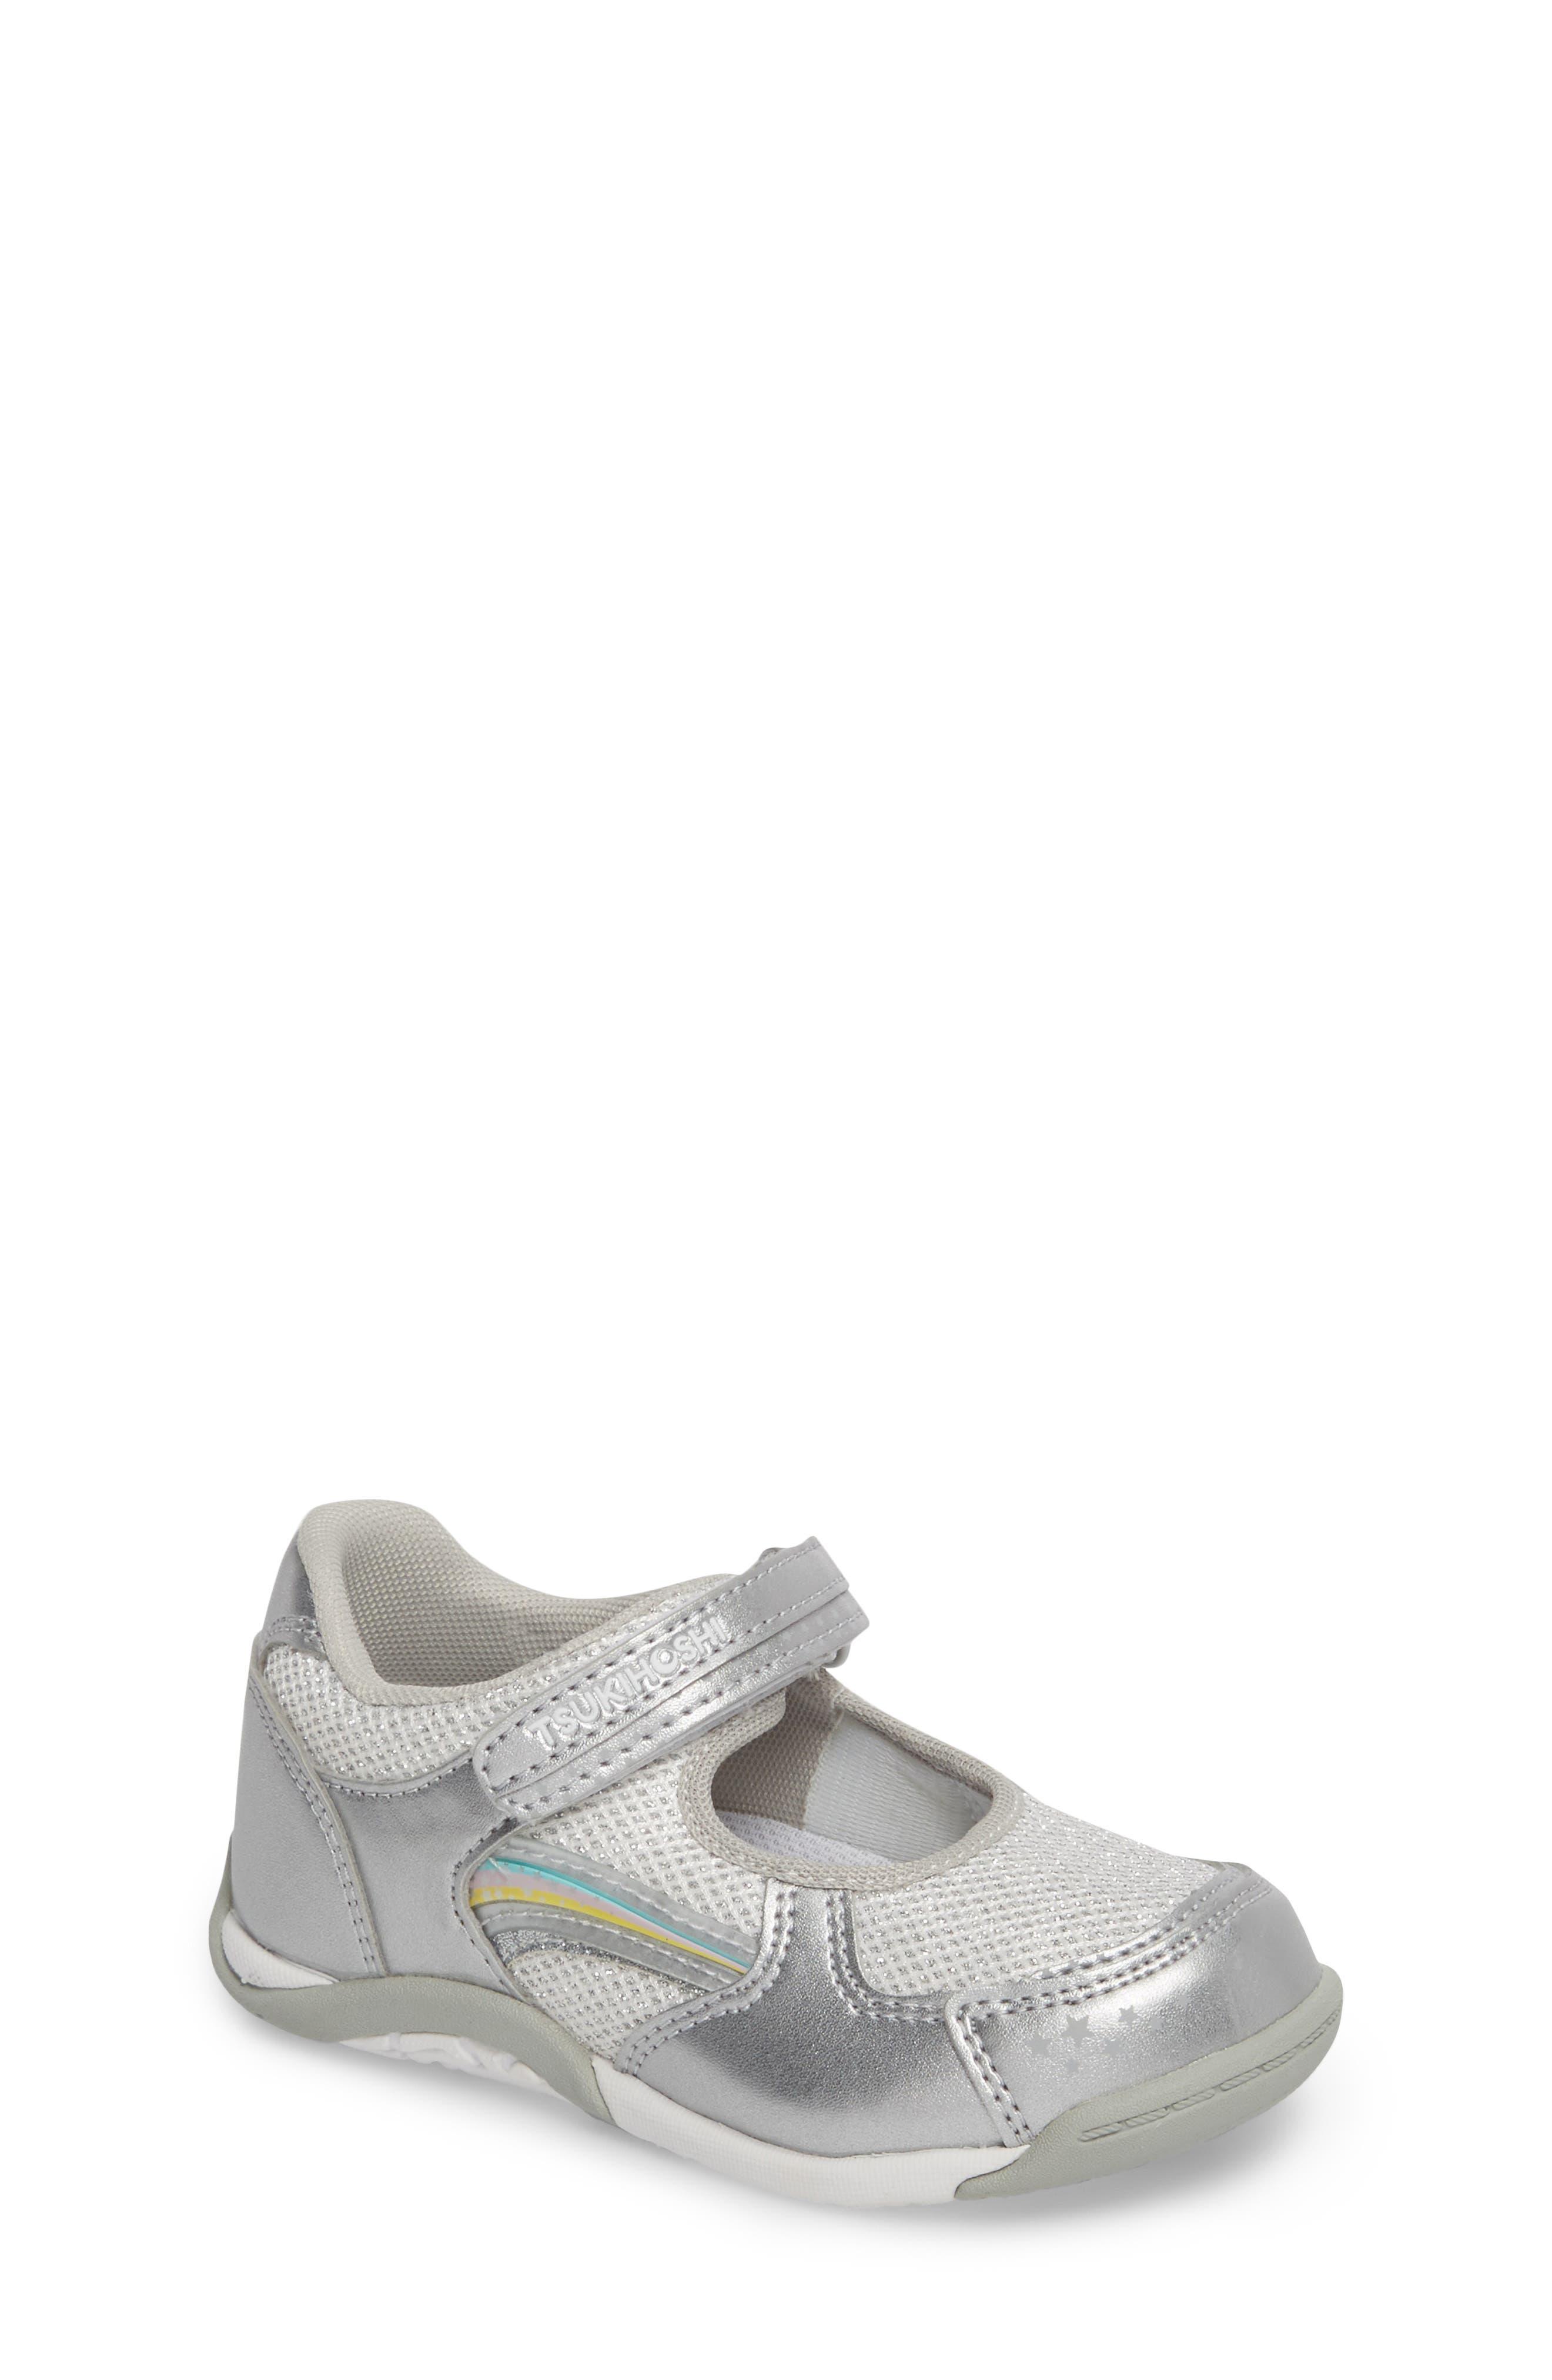 TSUKIHOSHI, Twinkle Washable Sneaker, Main thumbnail 1, color, SILVER/ SILVER